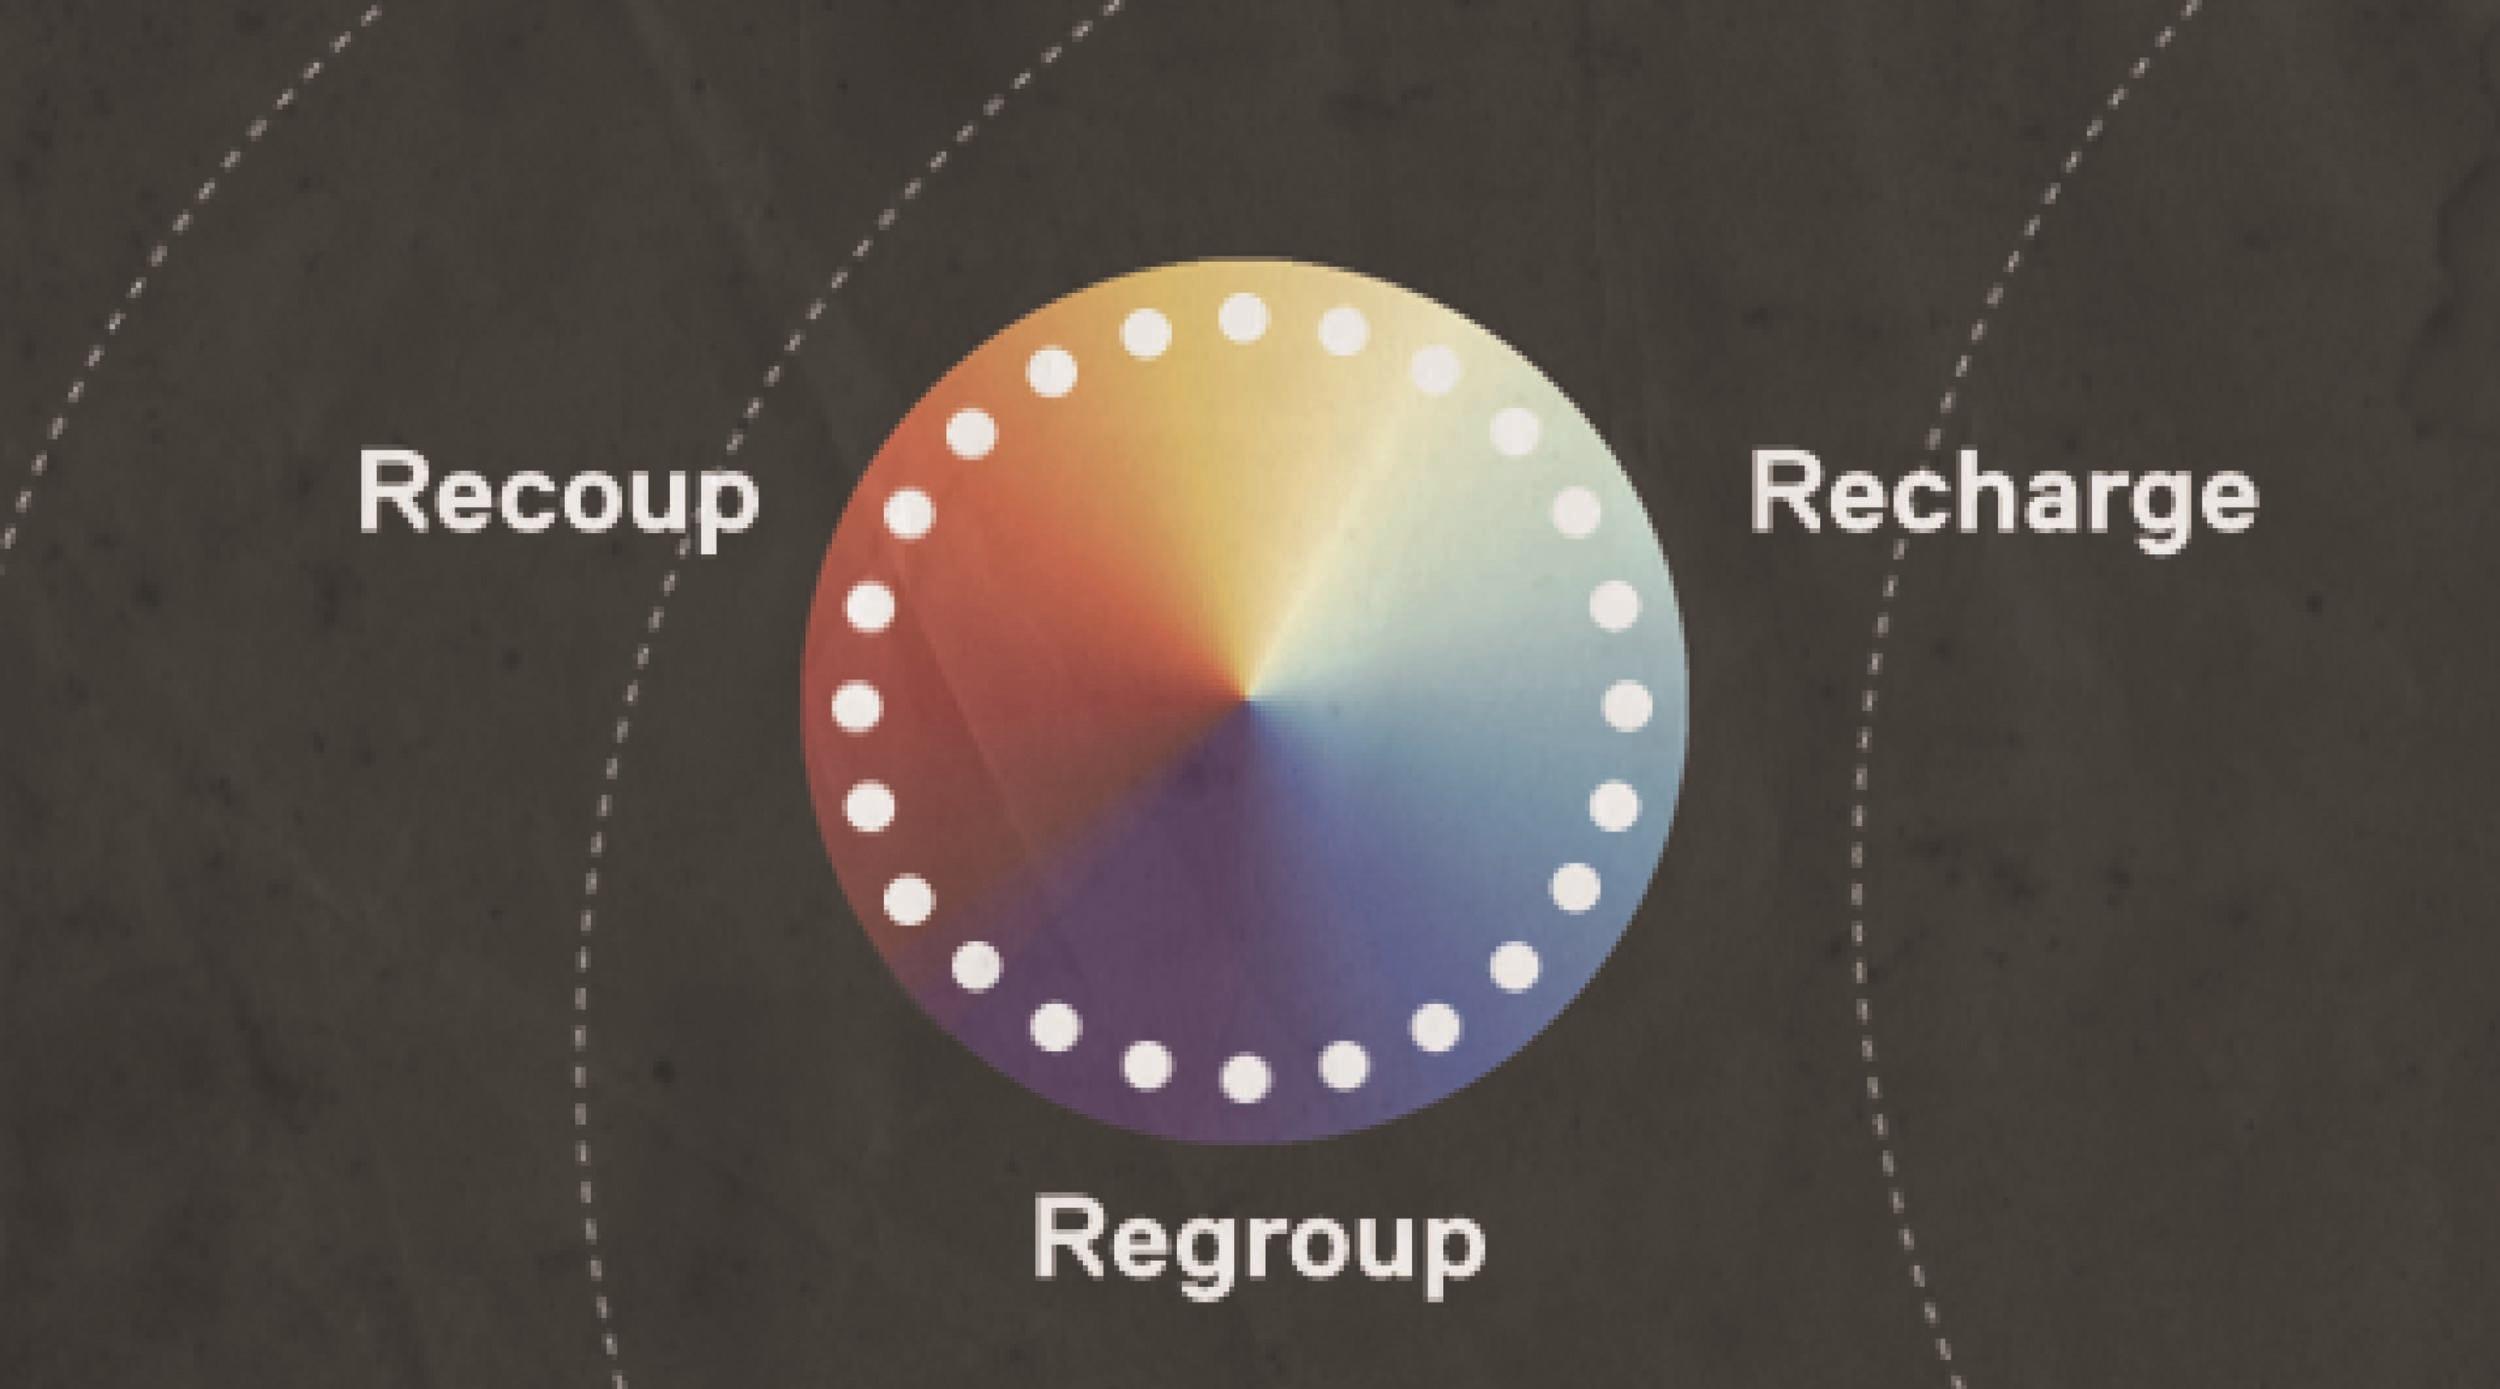 RECHARGE_REGROUP_RECOUP-01.jpg